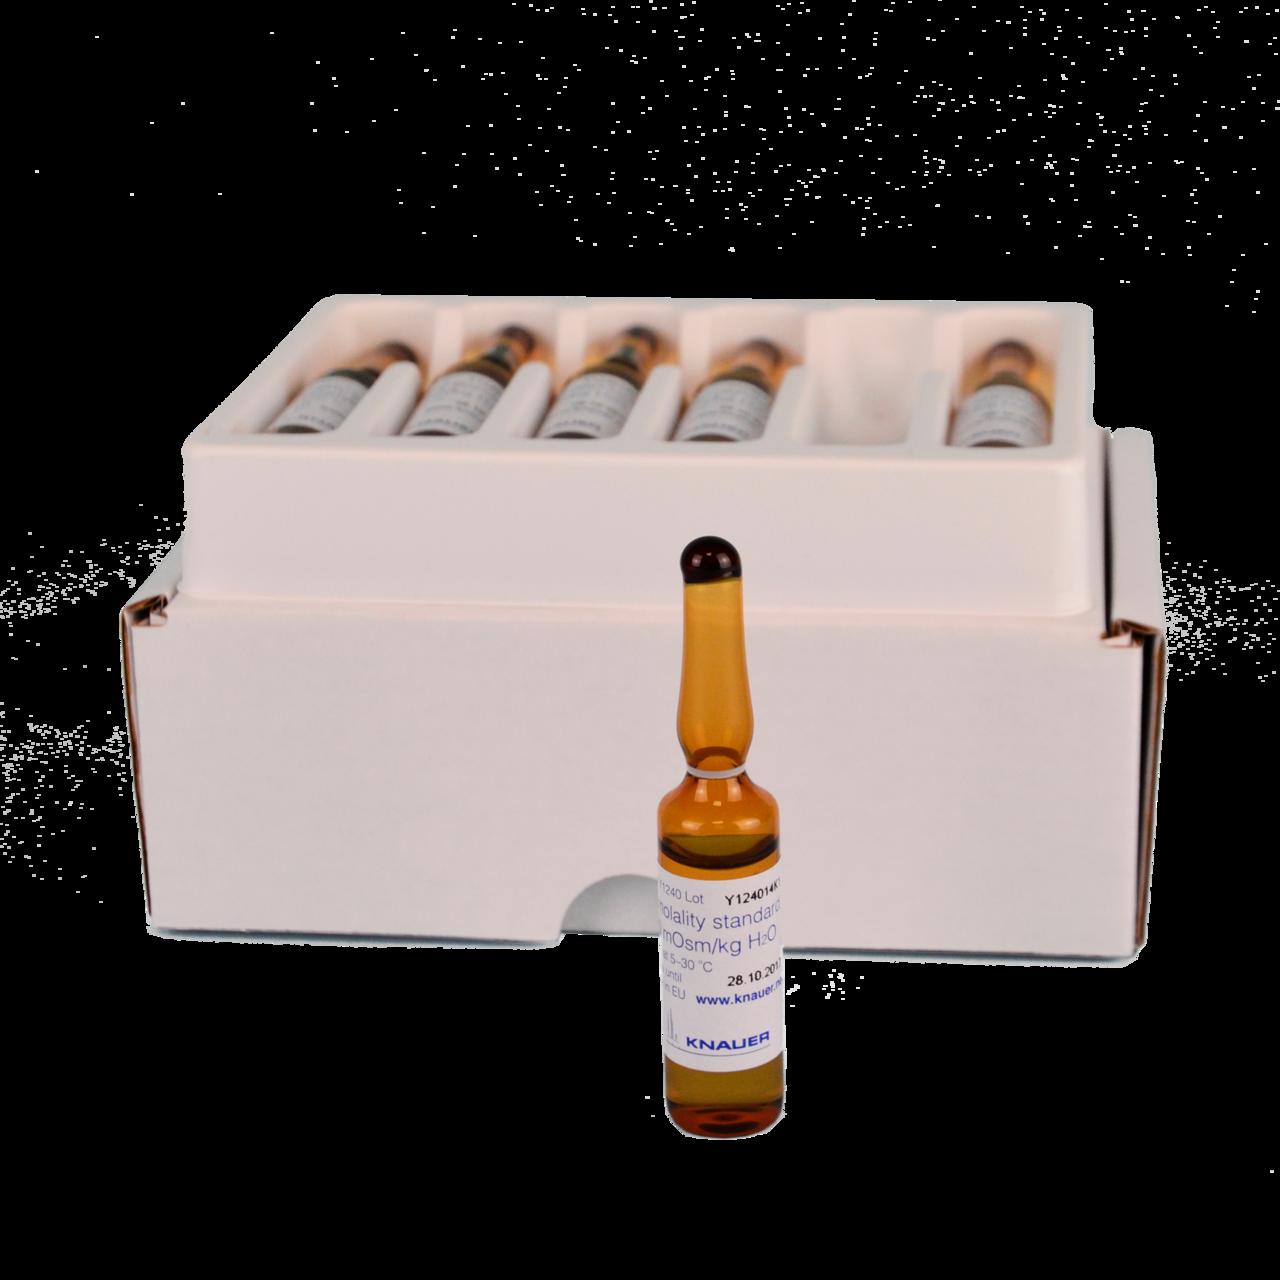 400 mOsmol/kg calibration solution 12 vials, 5 ml each certified CoA available online